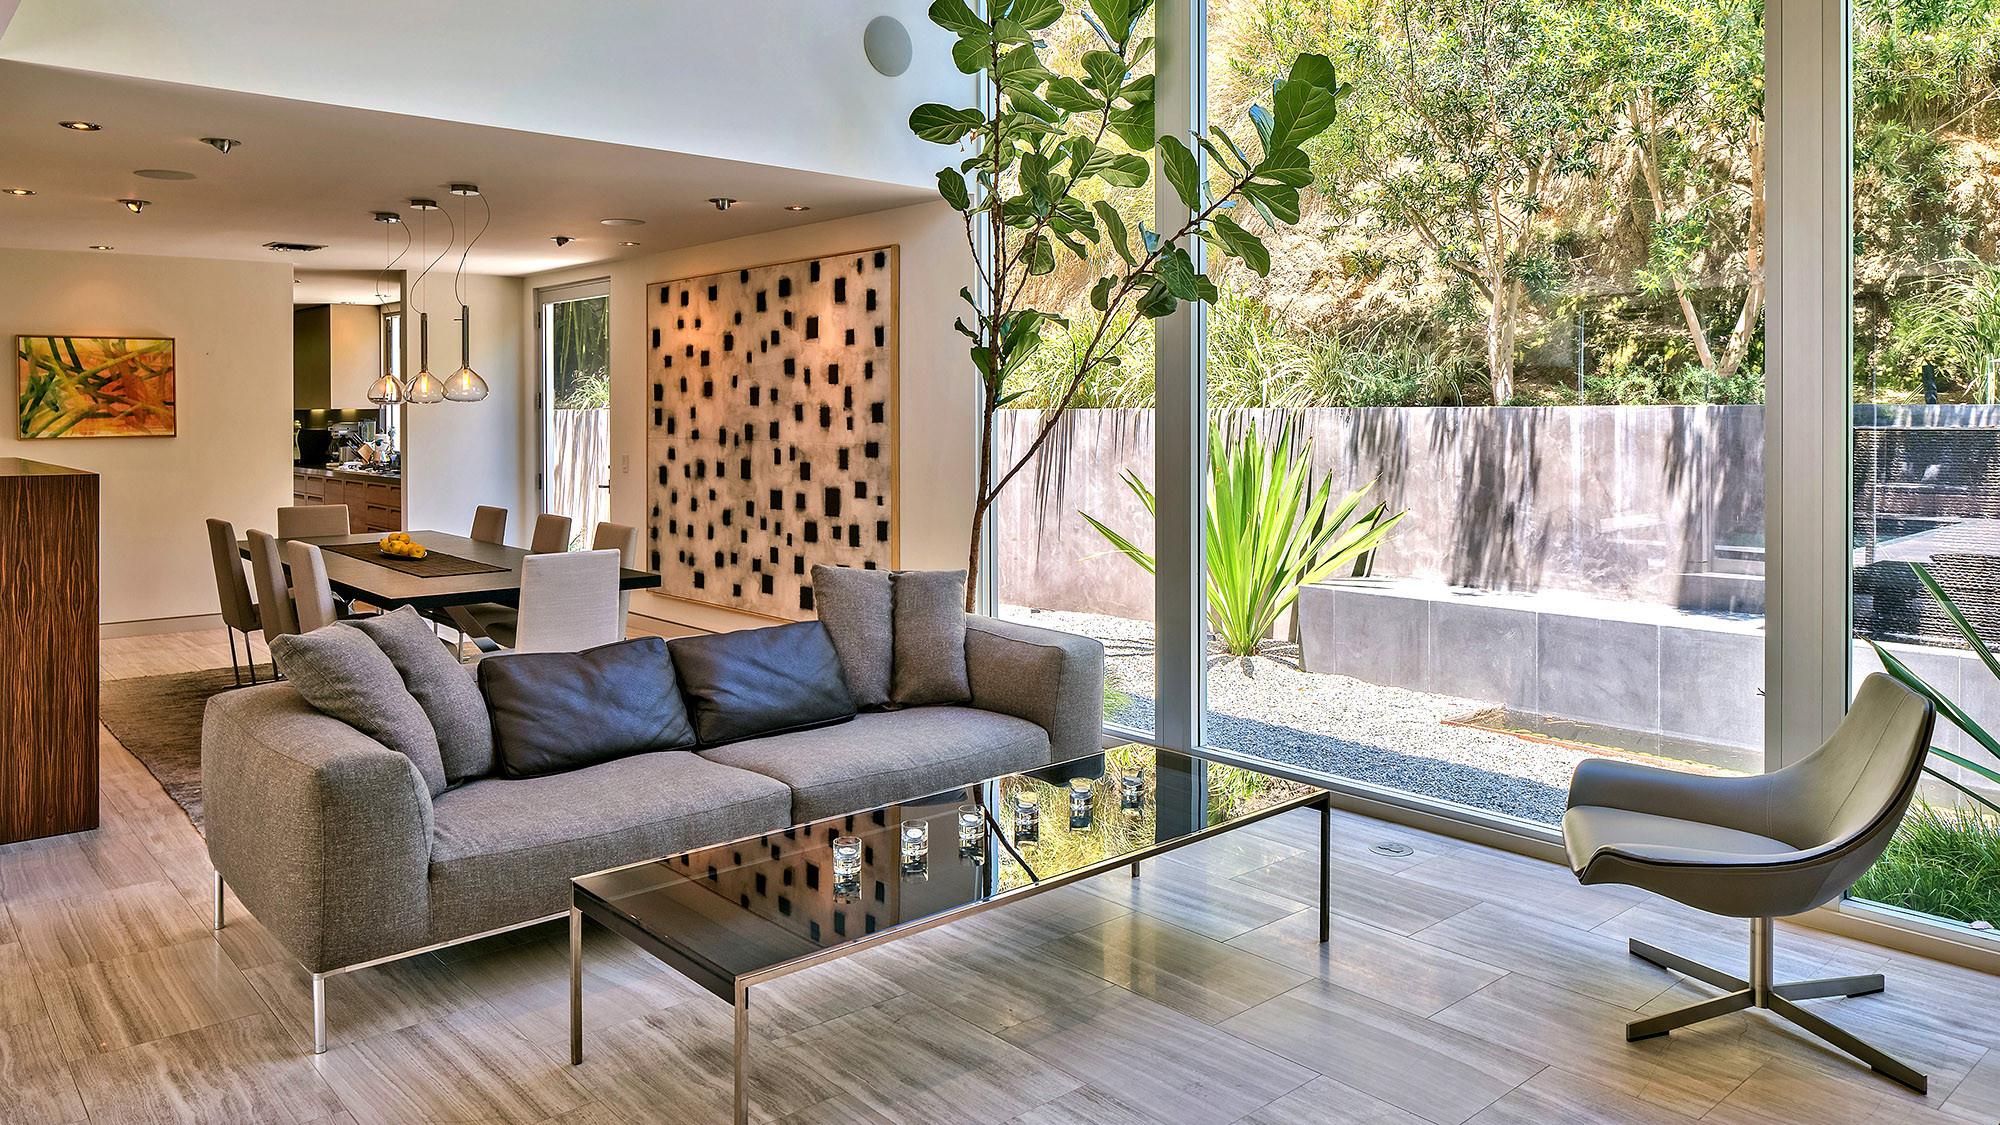 Meryl Streep House meryl streep sells hollywood hills west home to alex rodriguez